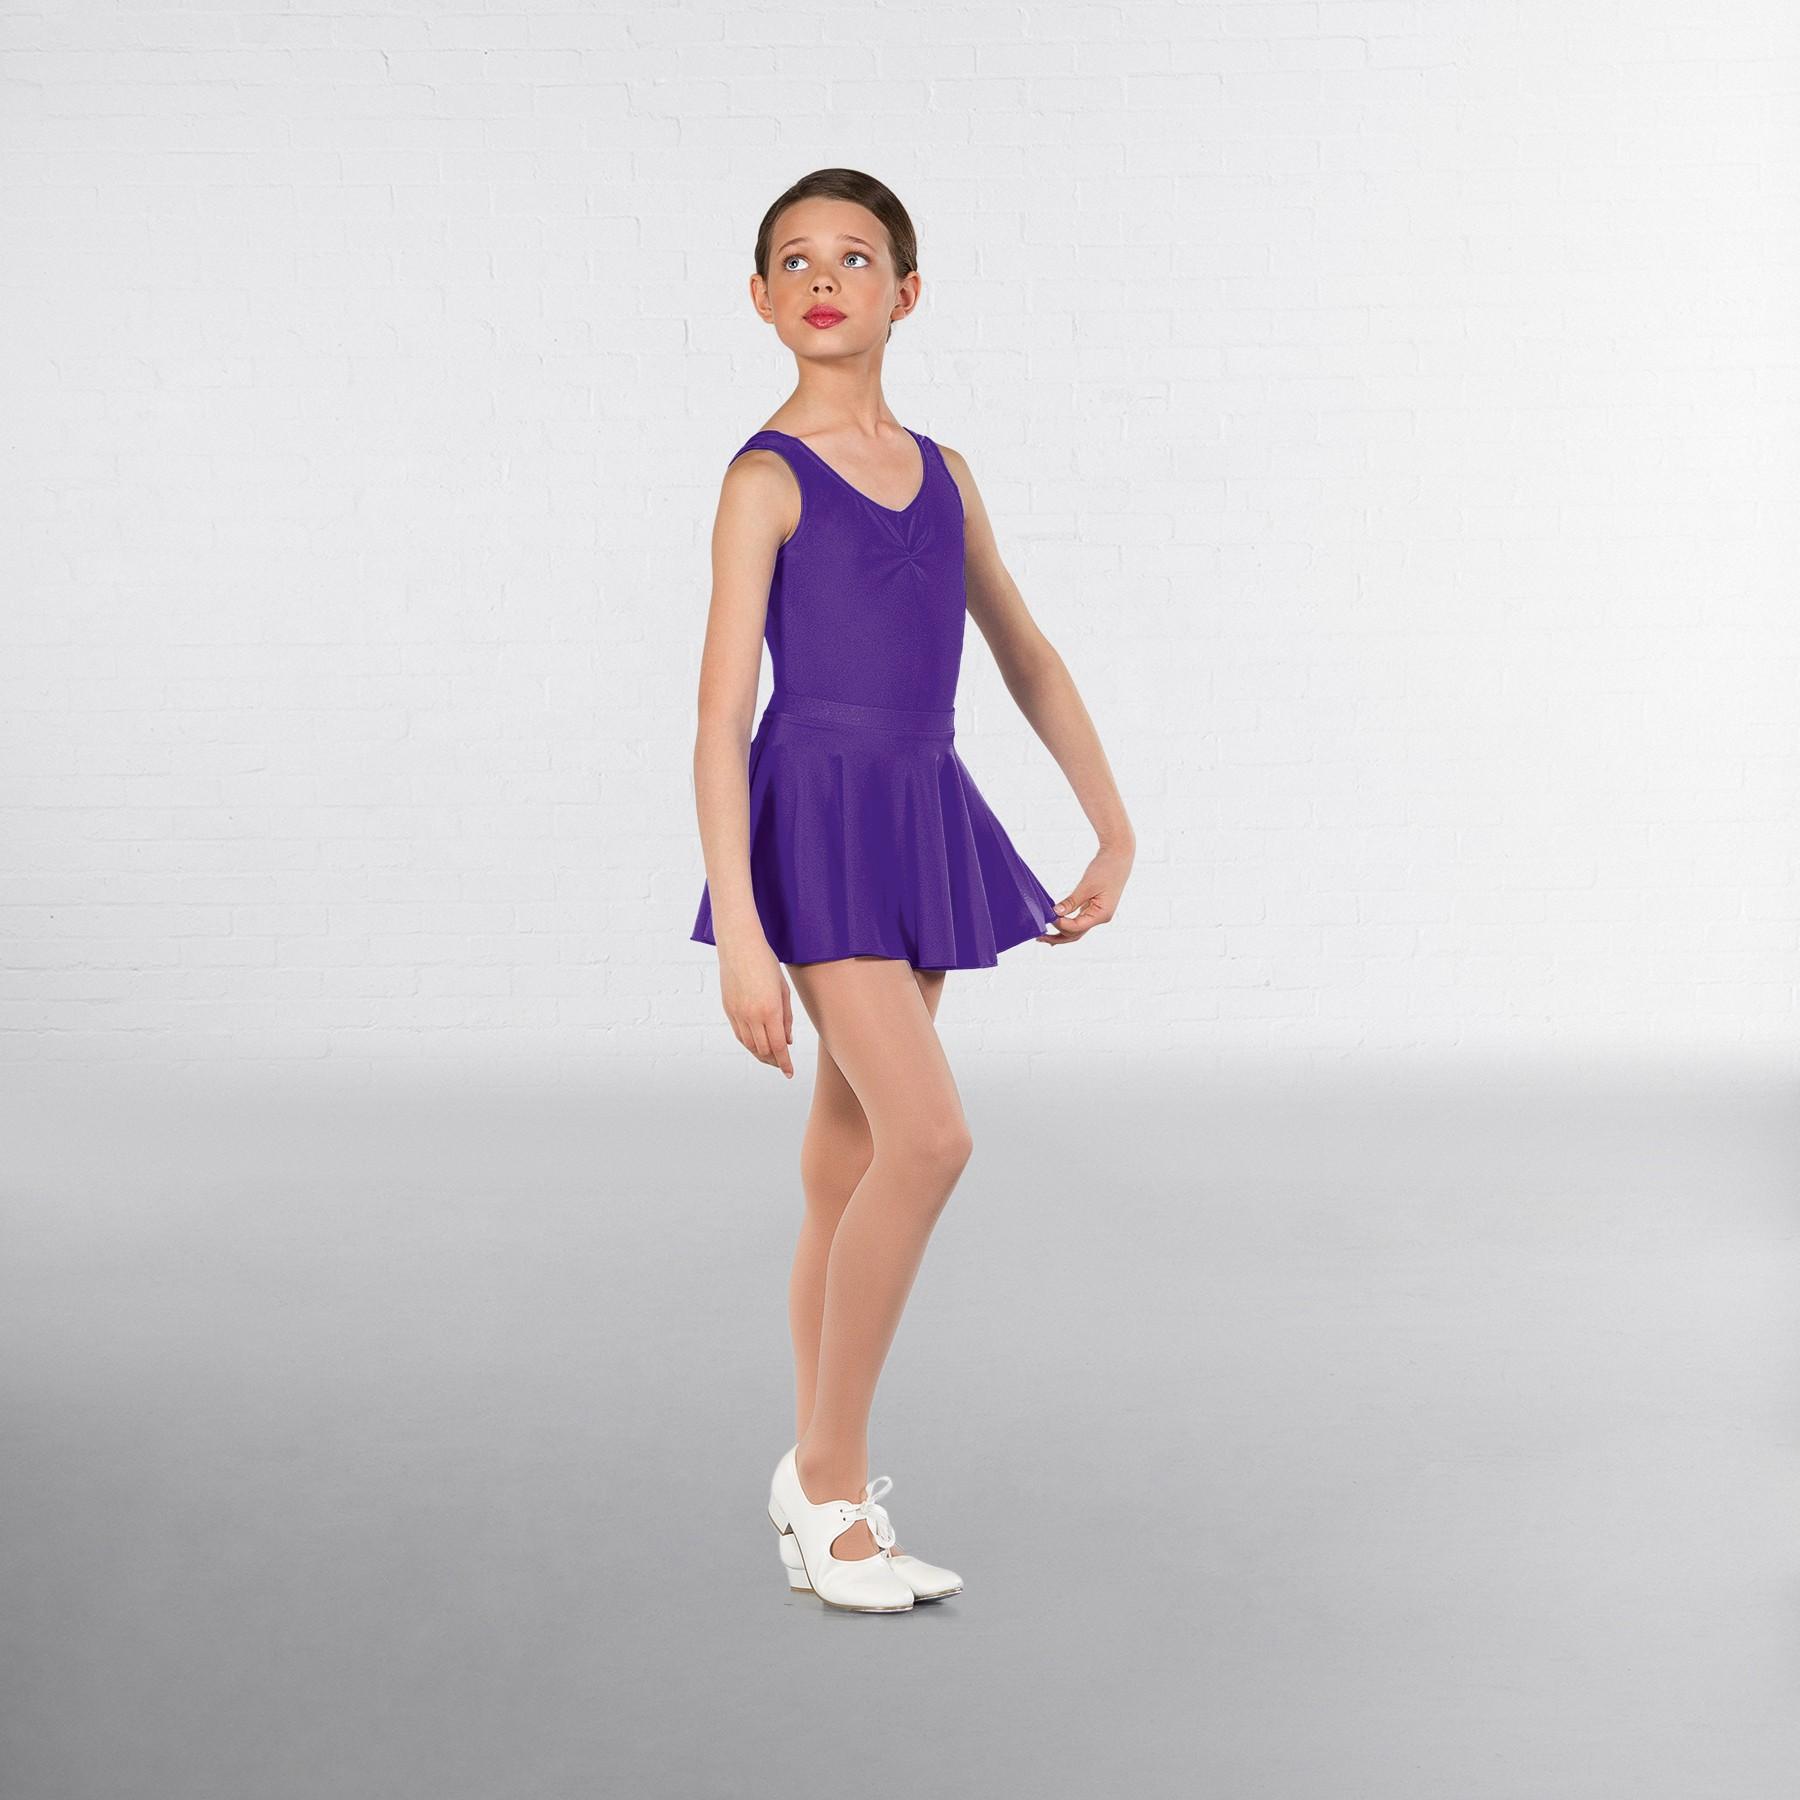 1st Position Circular Skirt (Delphinium)